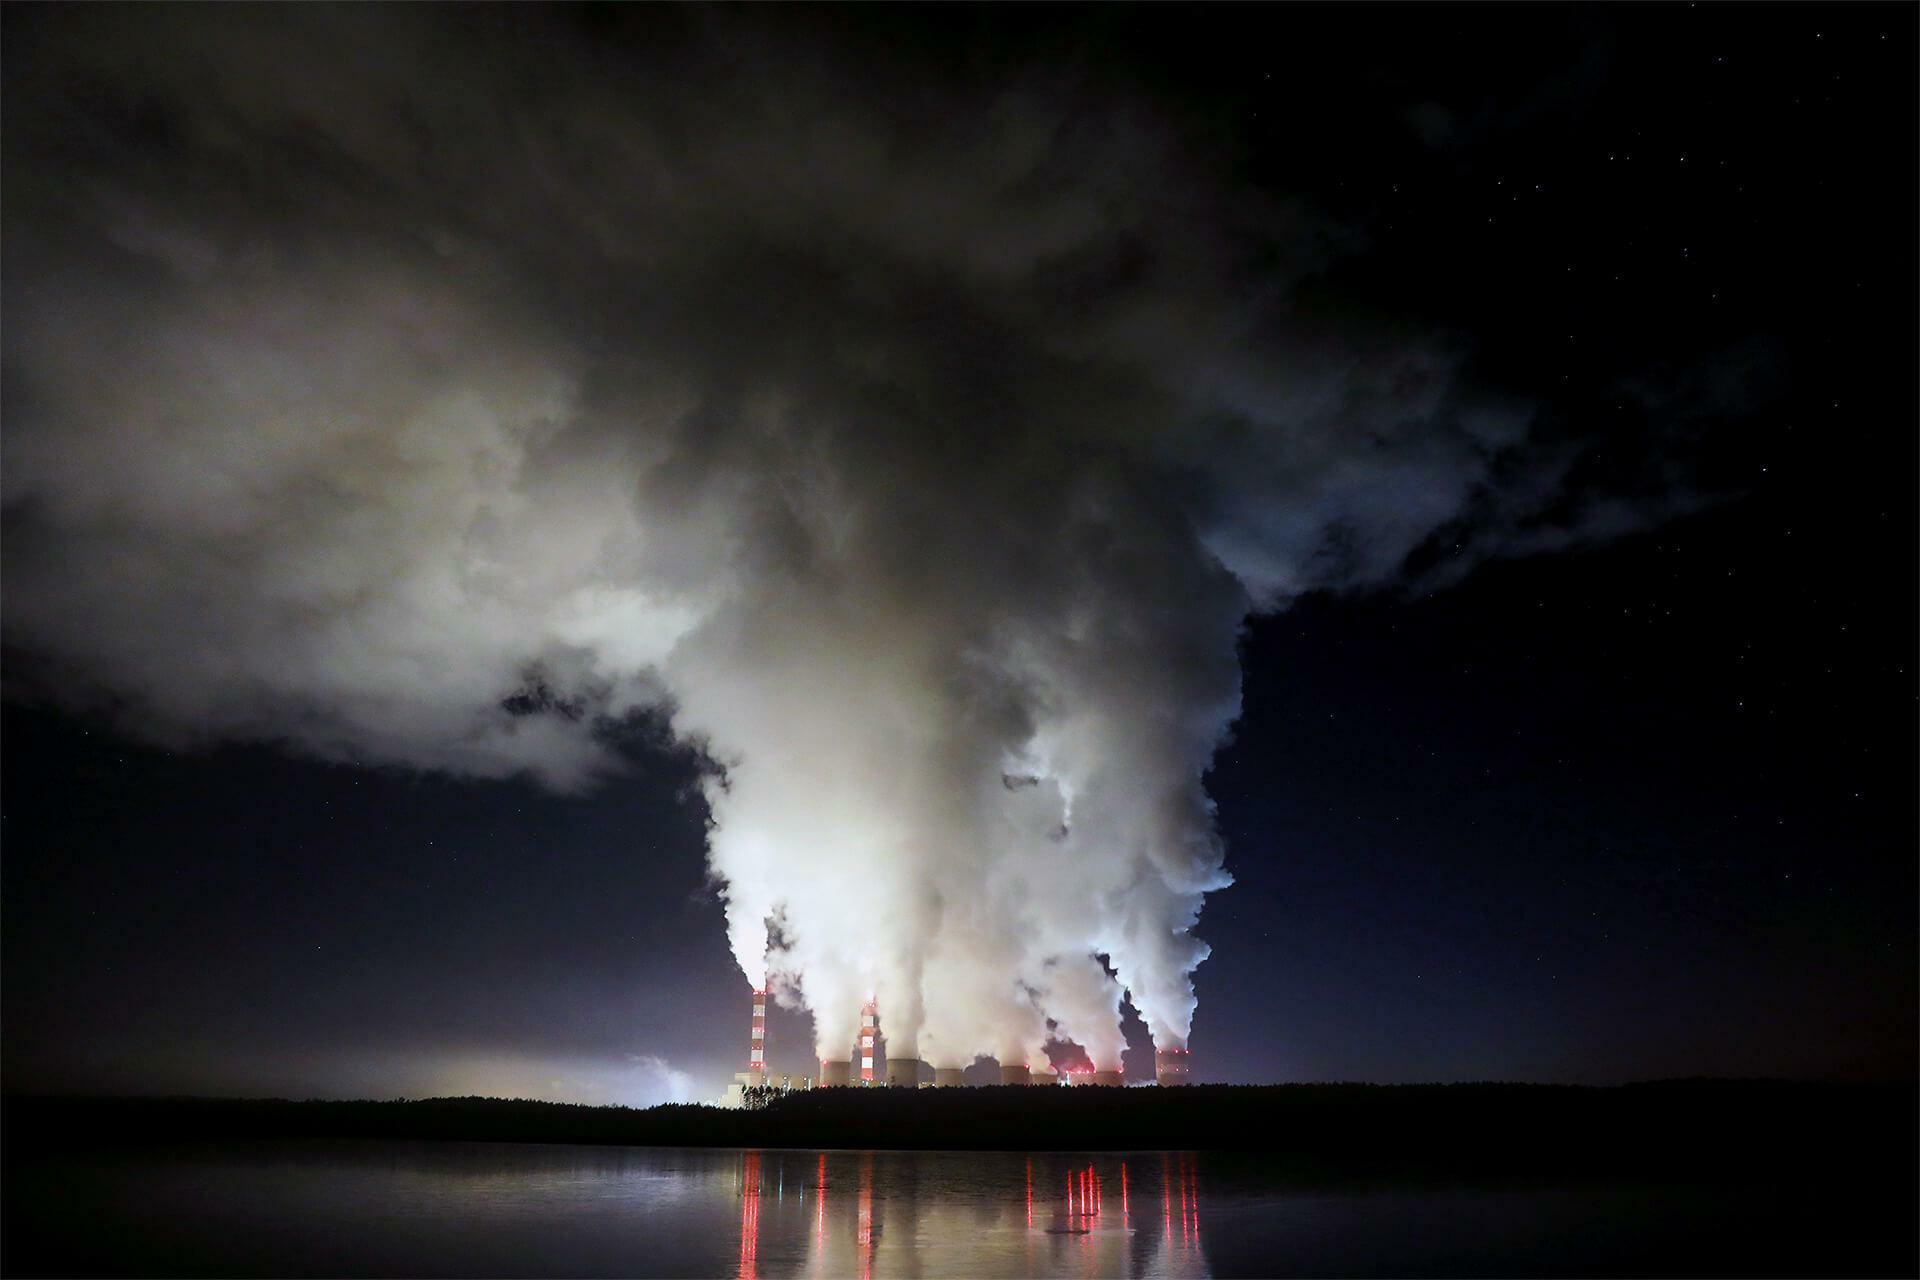 Braunkohlekraftwerk Bełchatów